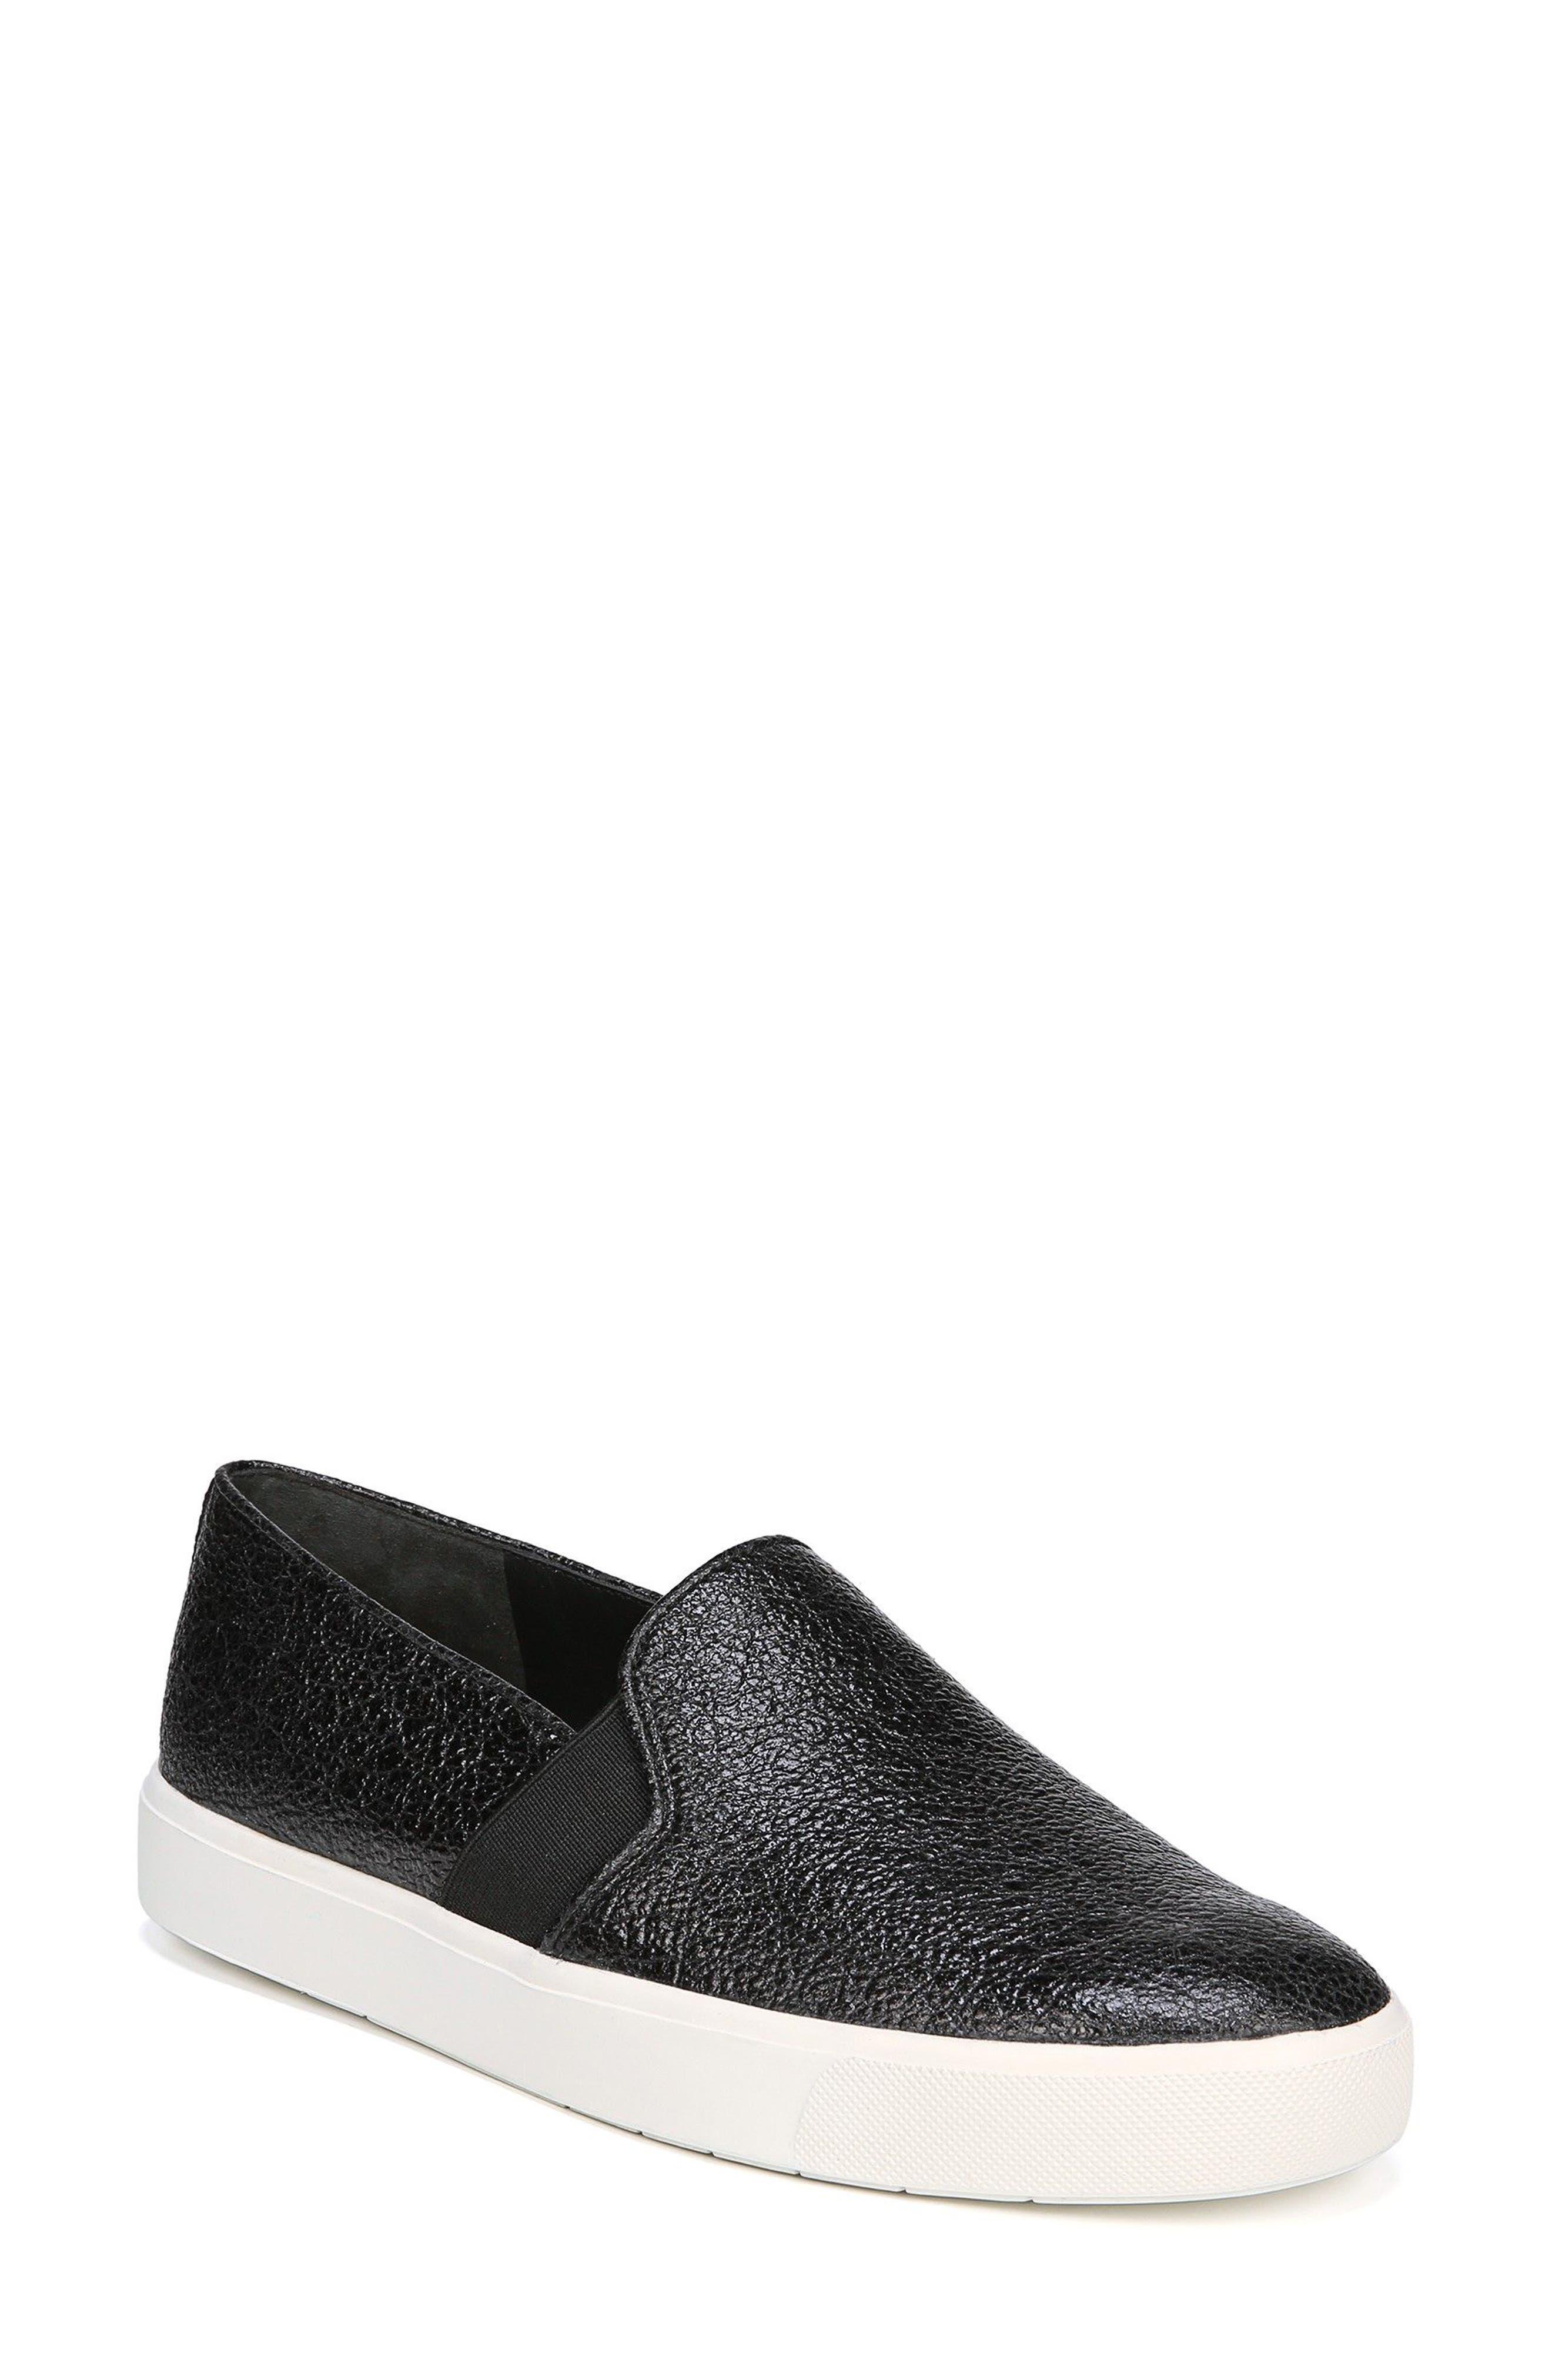 'Blair 12' Leather Slip-On Sneaker,                             Main thumbnail 1, color,                             BLACK LEATHER